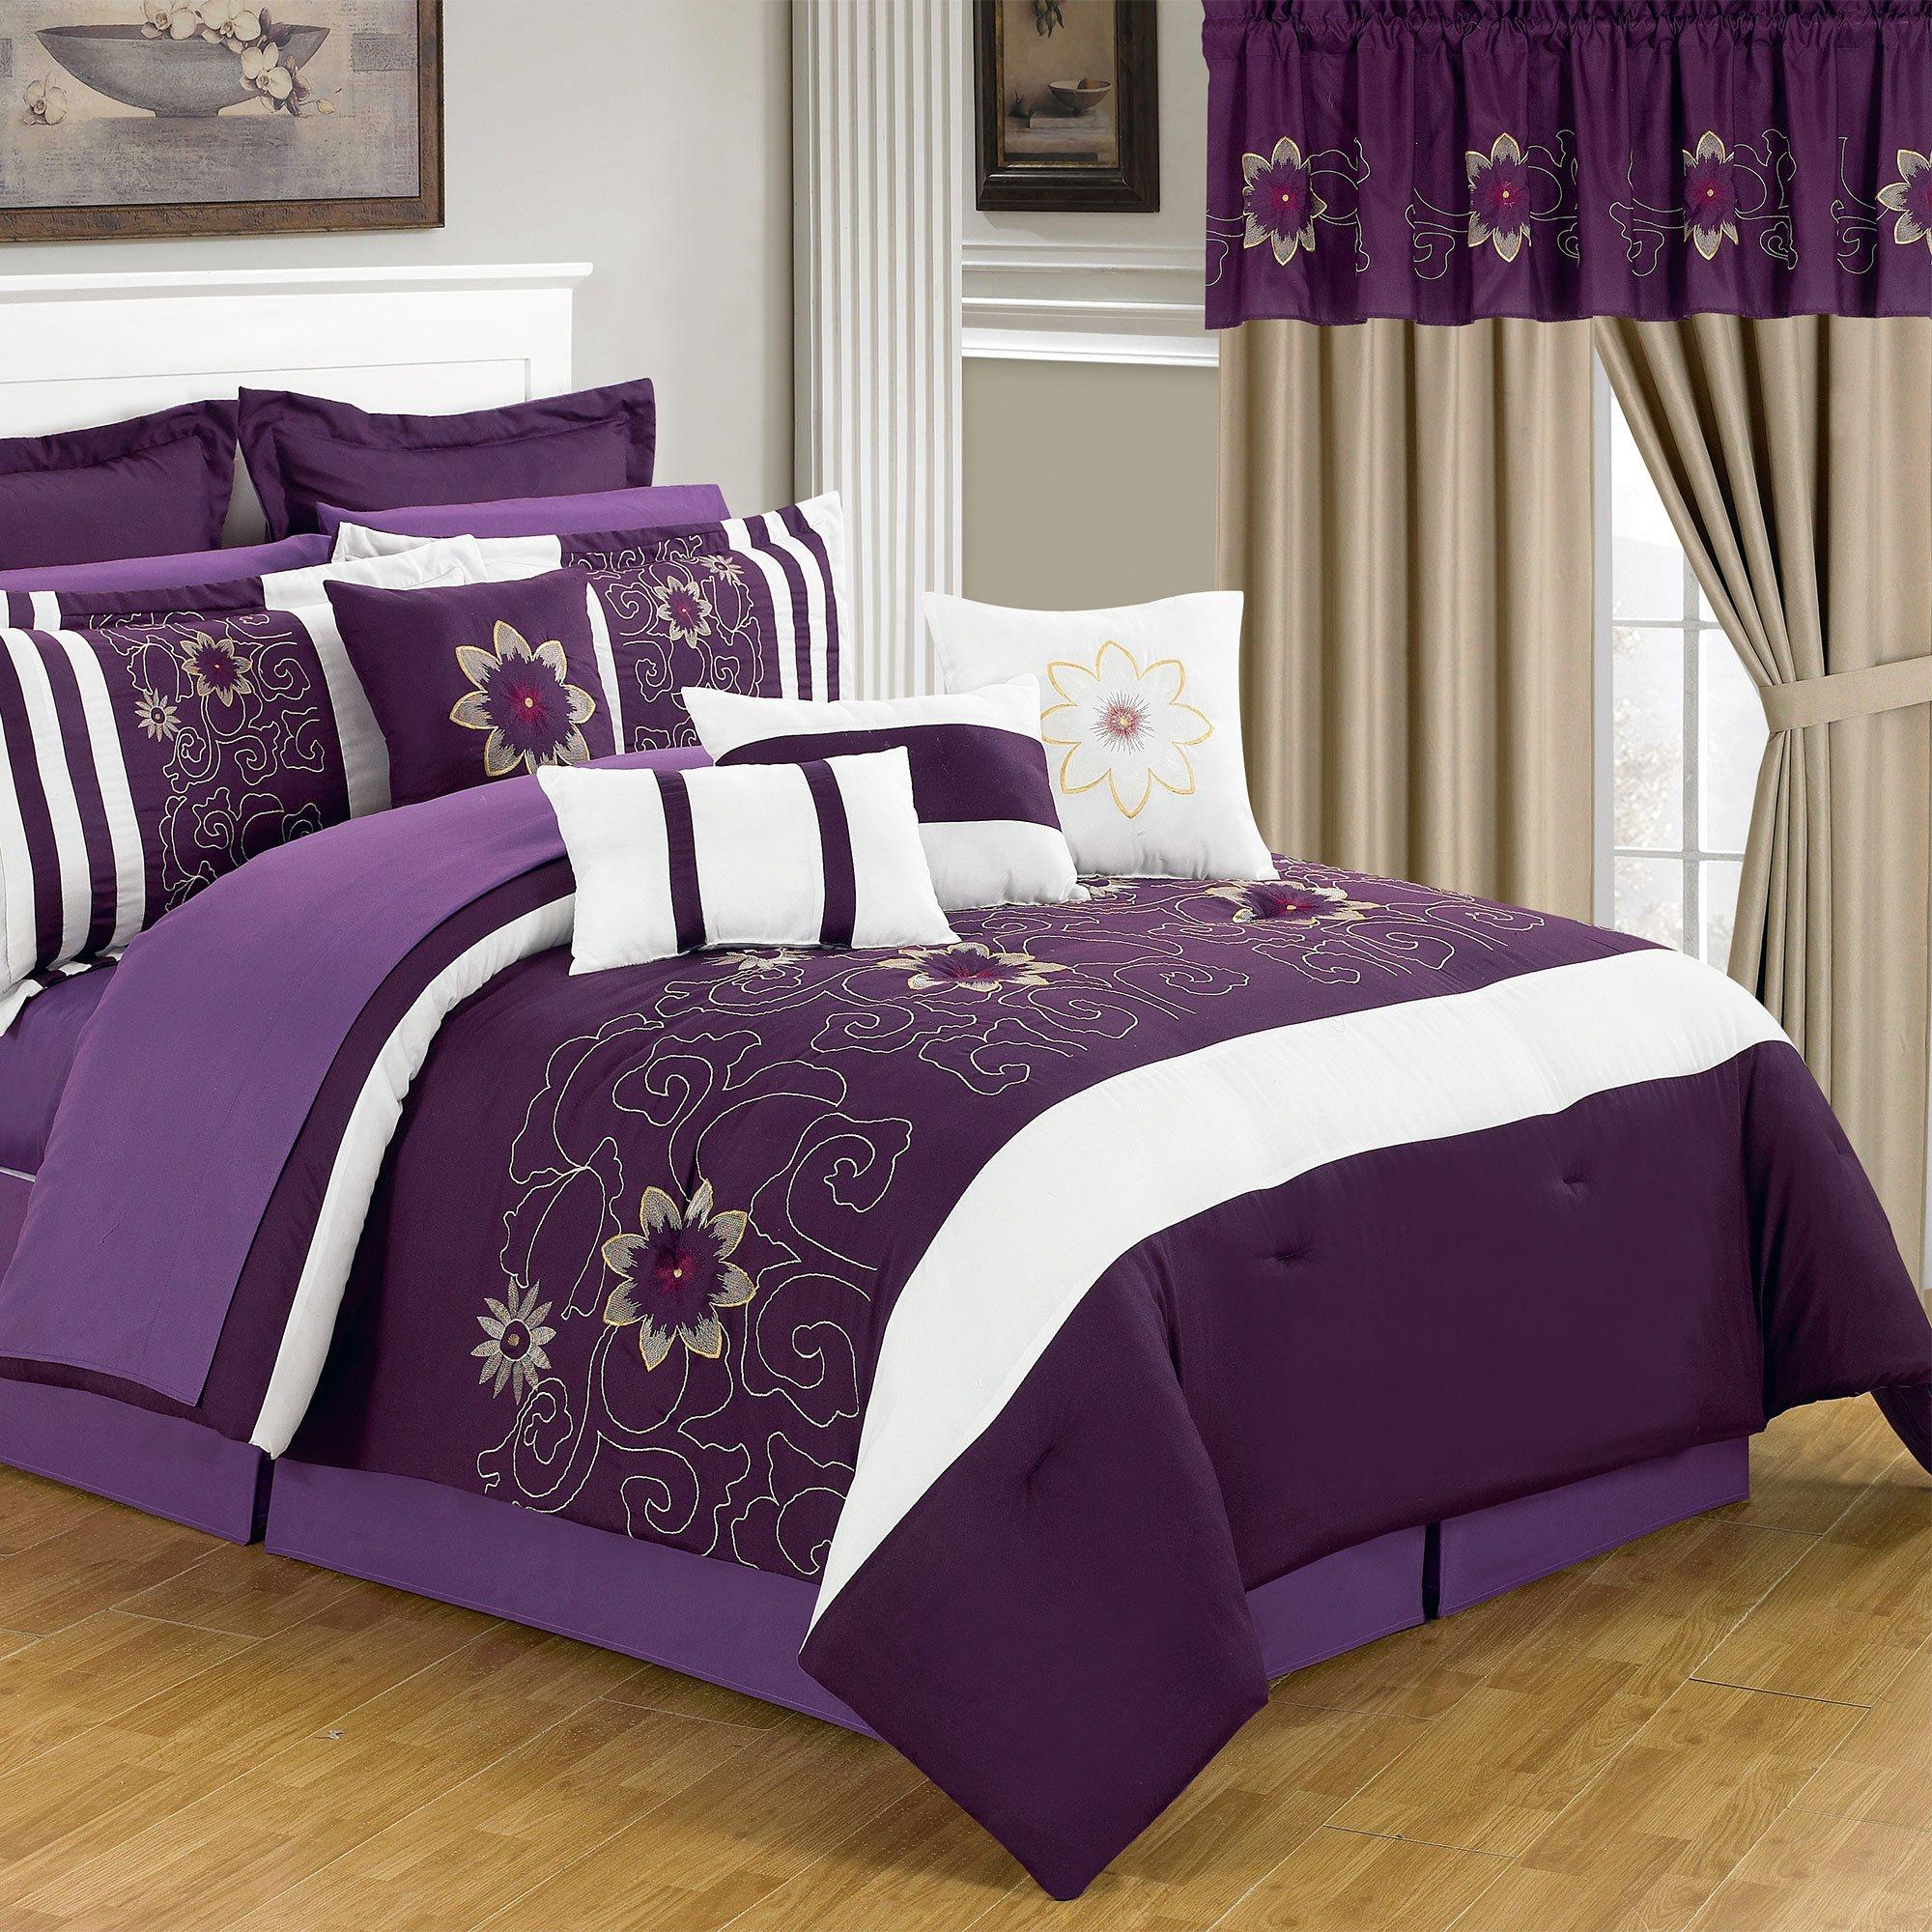 Lavish Home 66-00014-24pc-K 25-Piece Room-in-a-Bag Amanda Bedroom Set, King